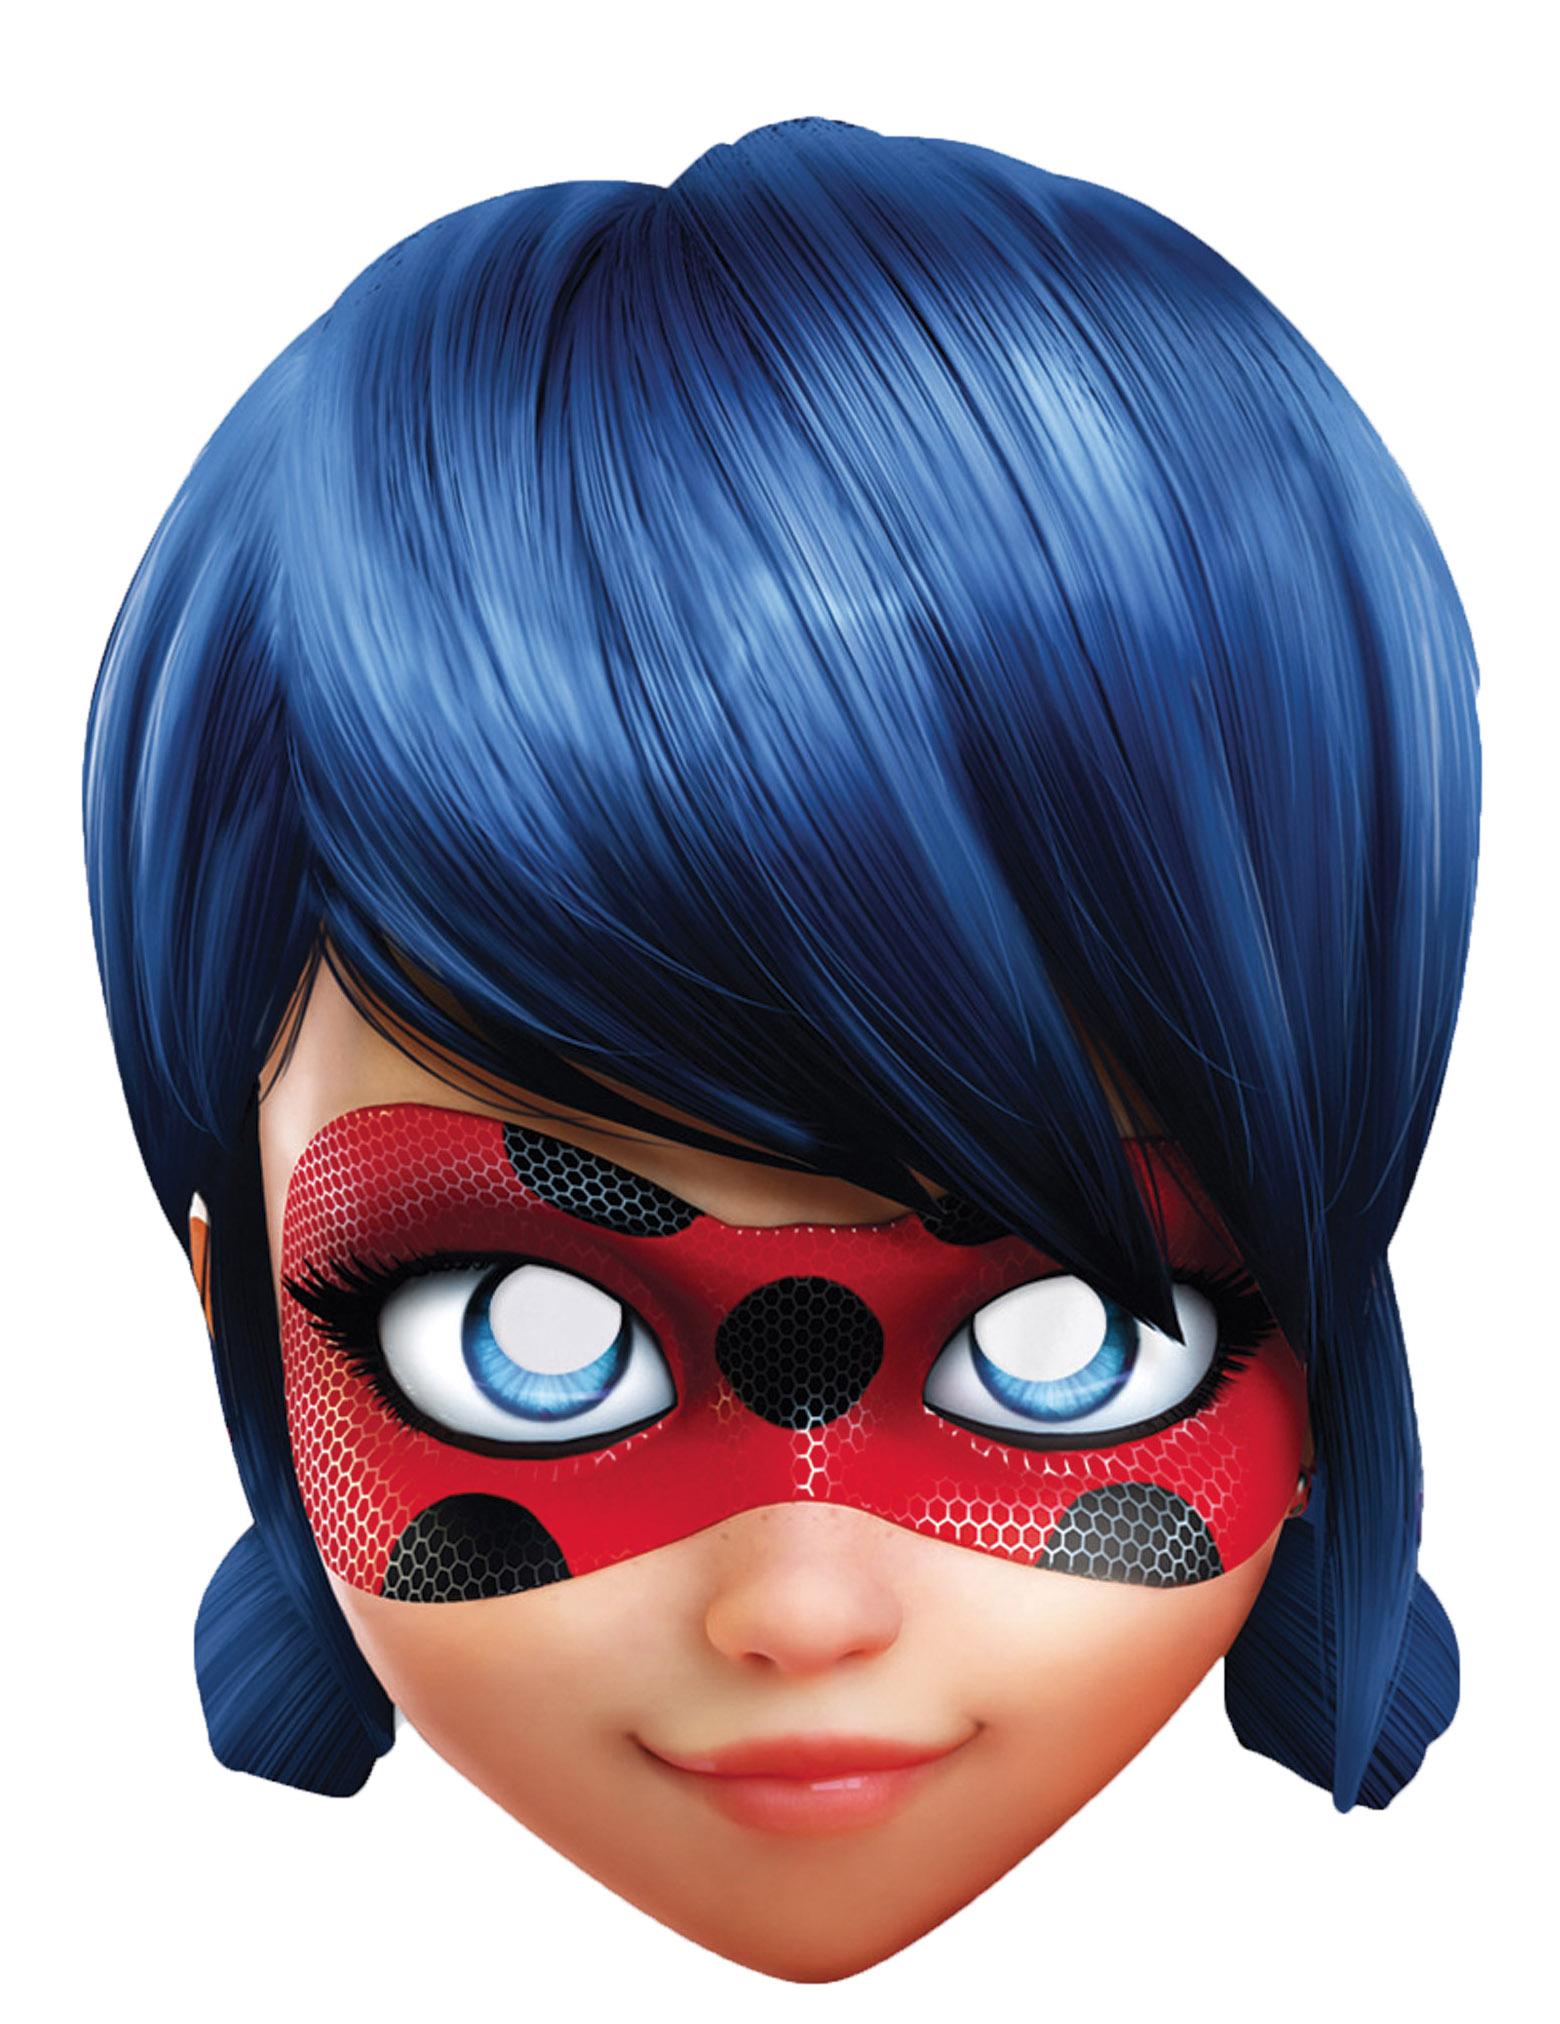 Maschera di cartone lady bug™ per bambino su